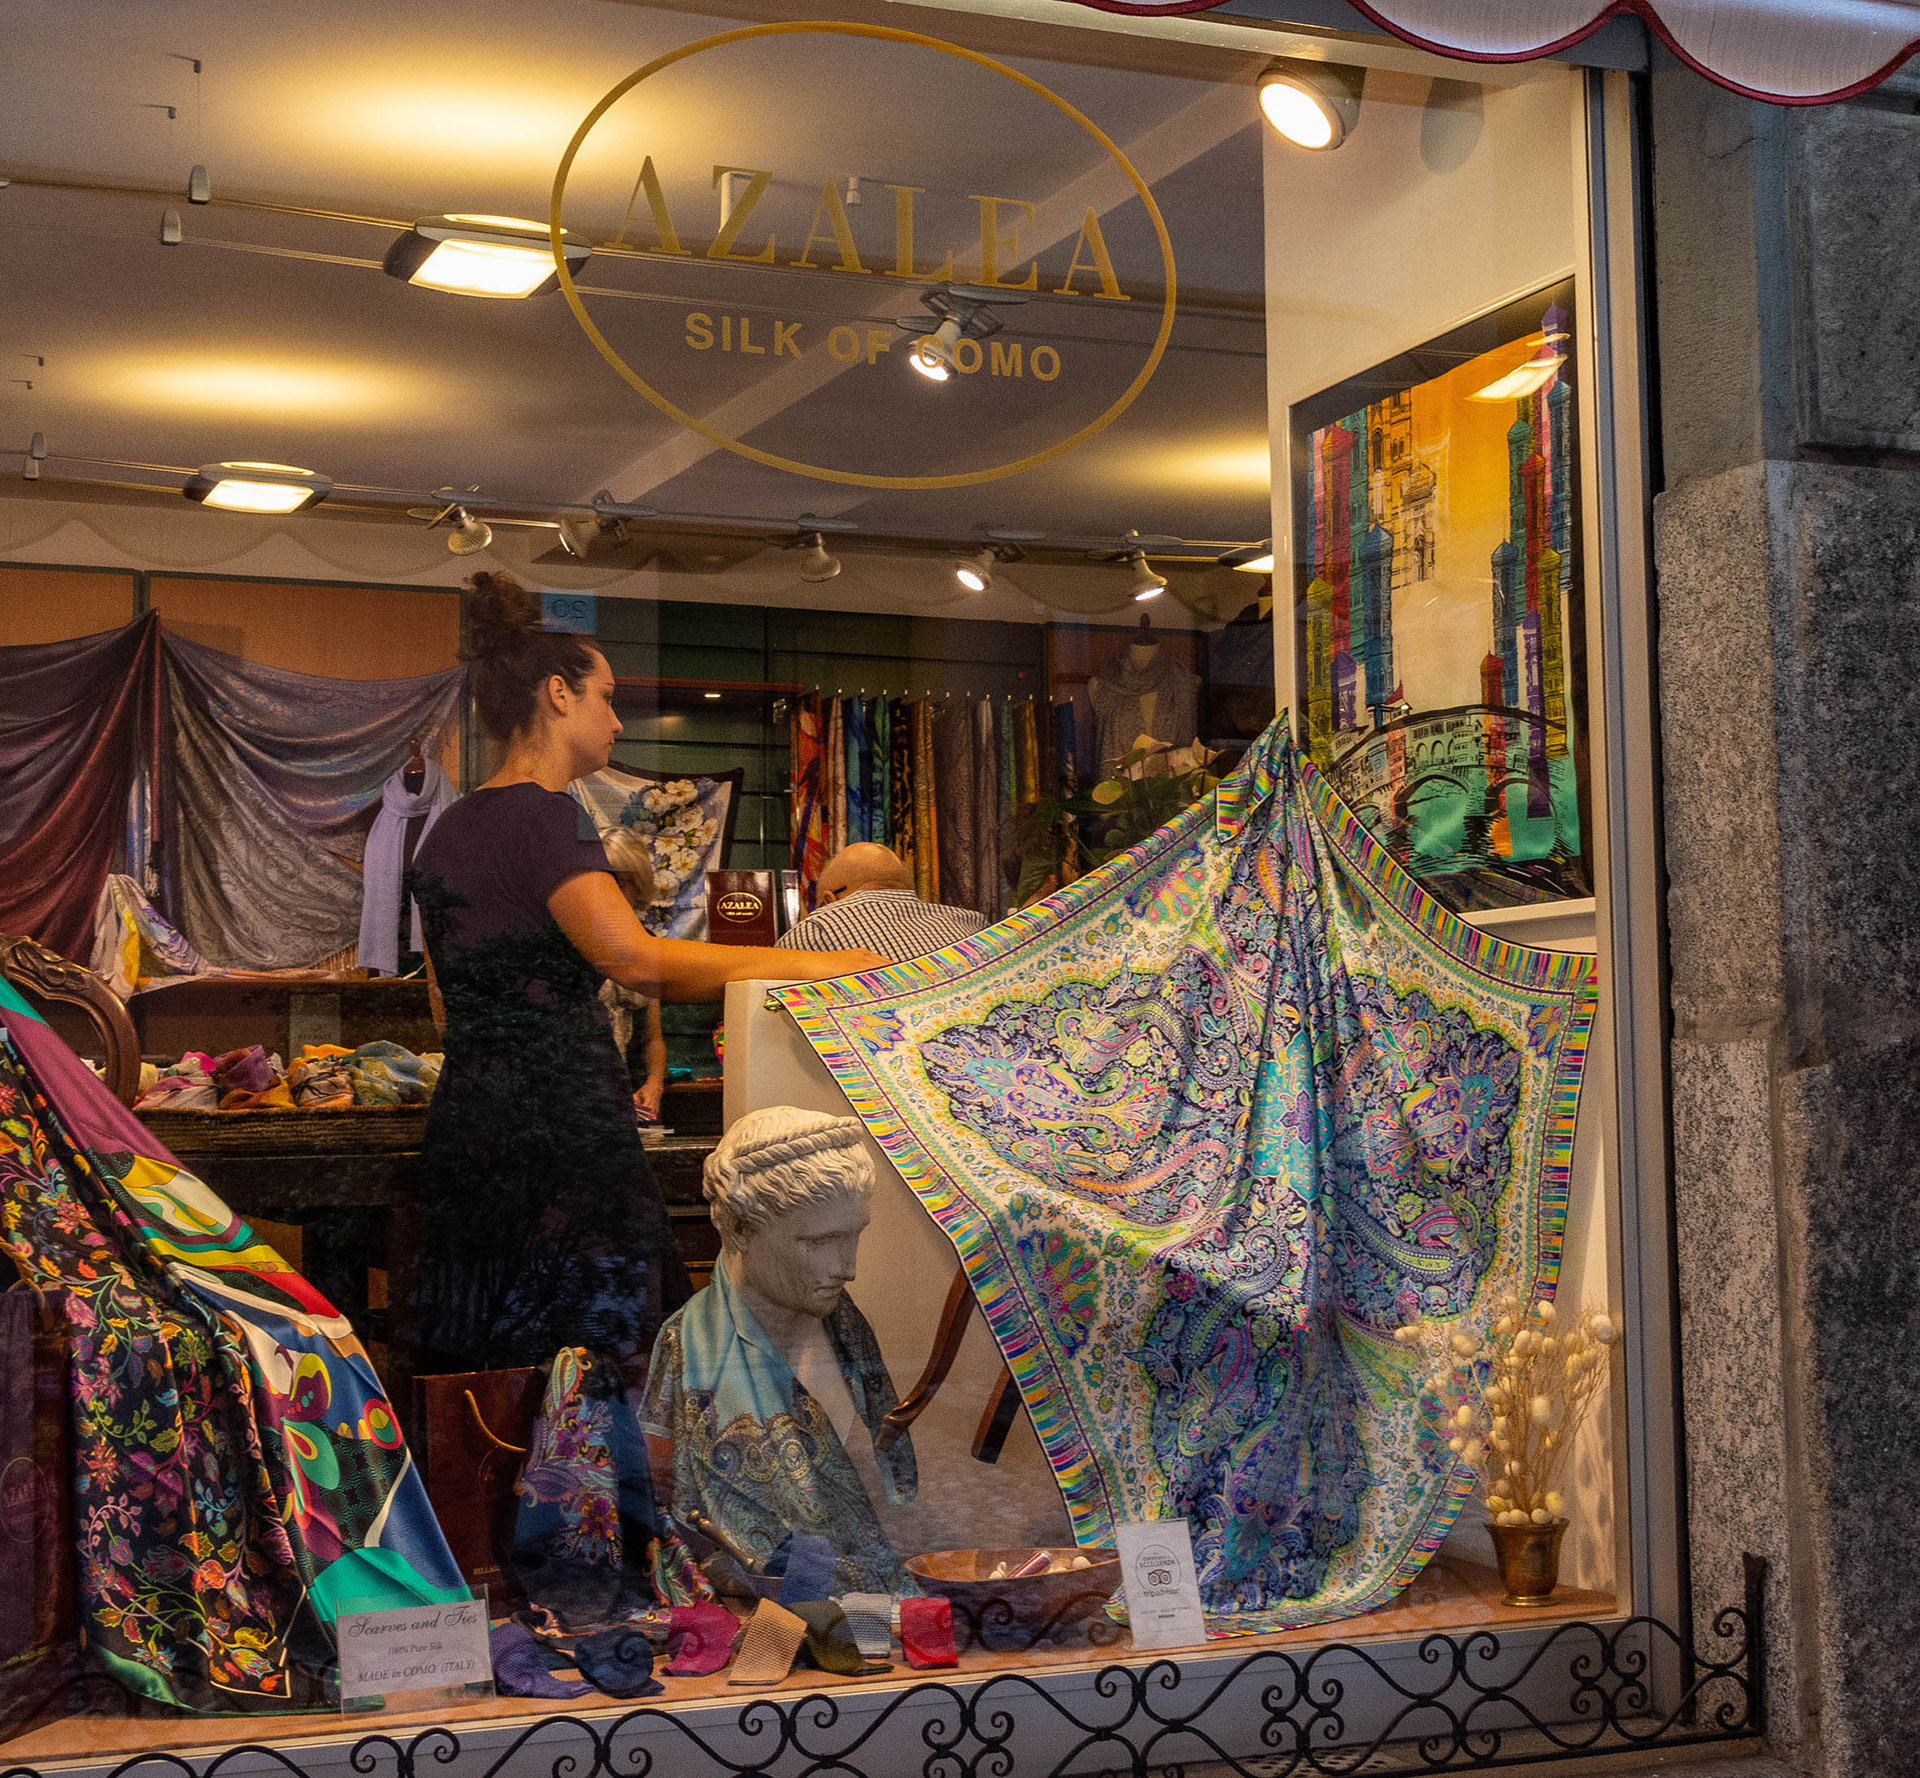 Como silk from Azalea on display in Bellagio